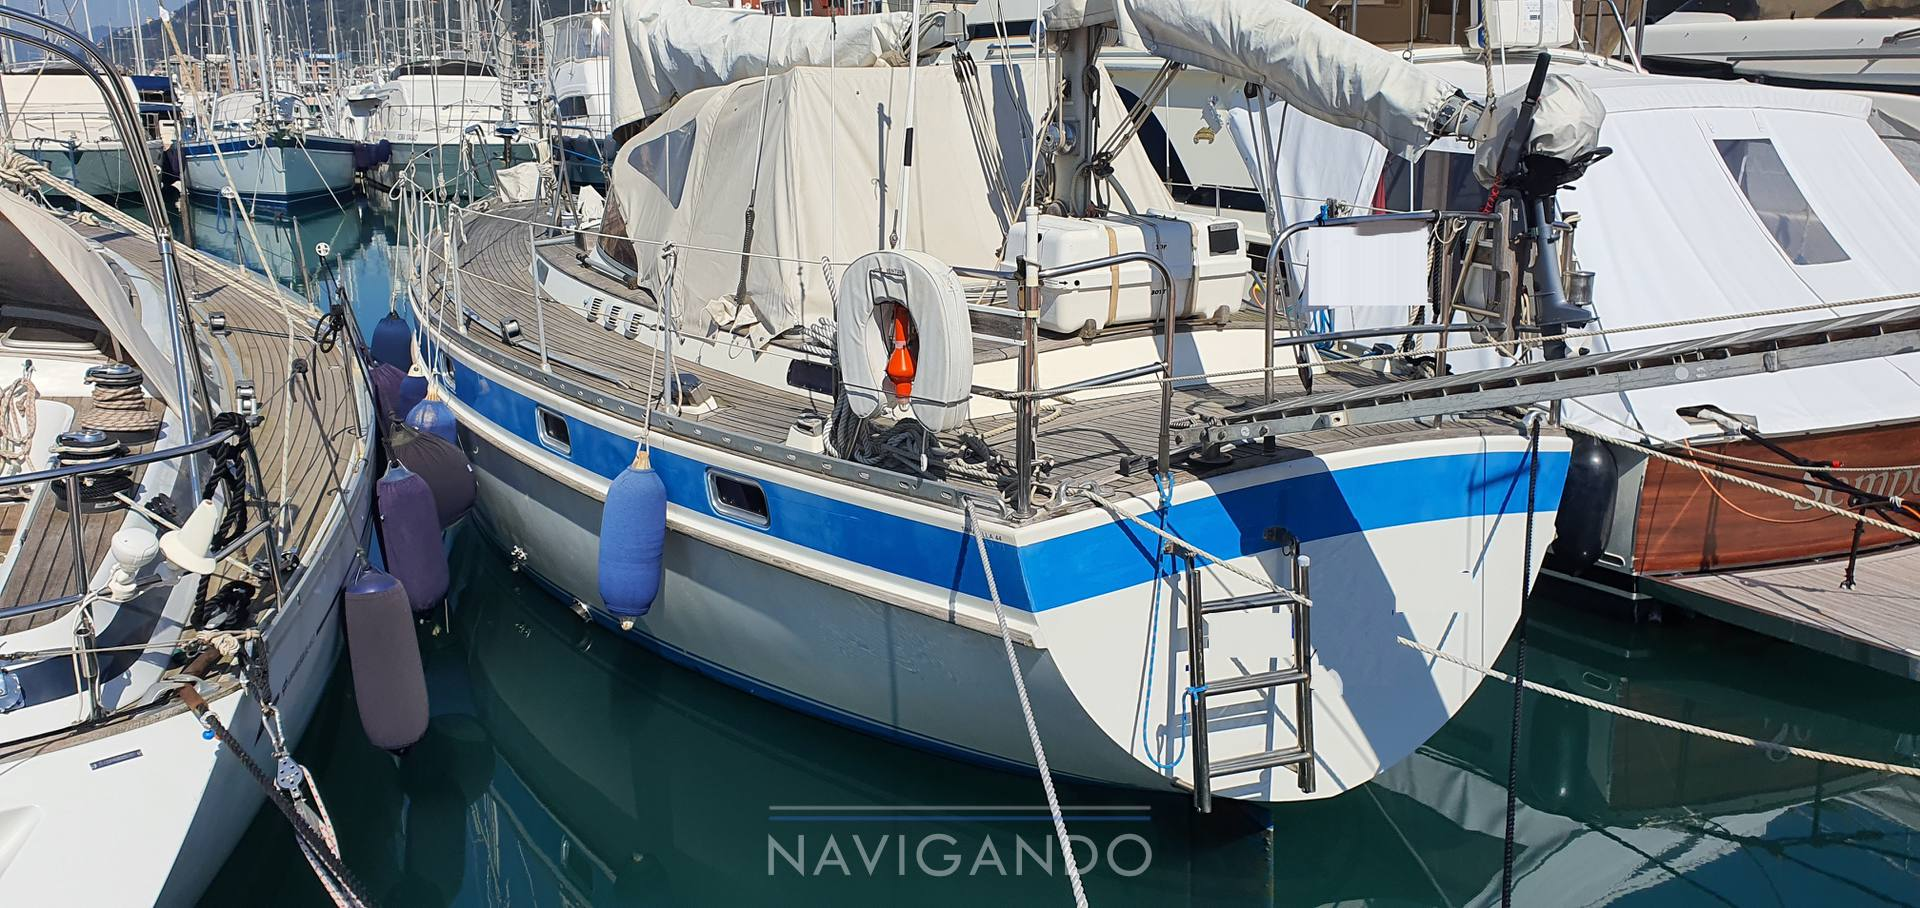 Trintella 44 ketch Sailing boat used for sale